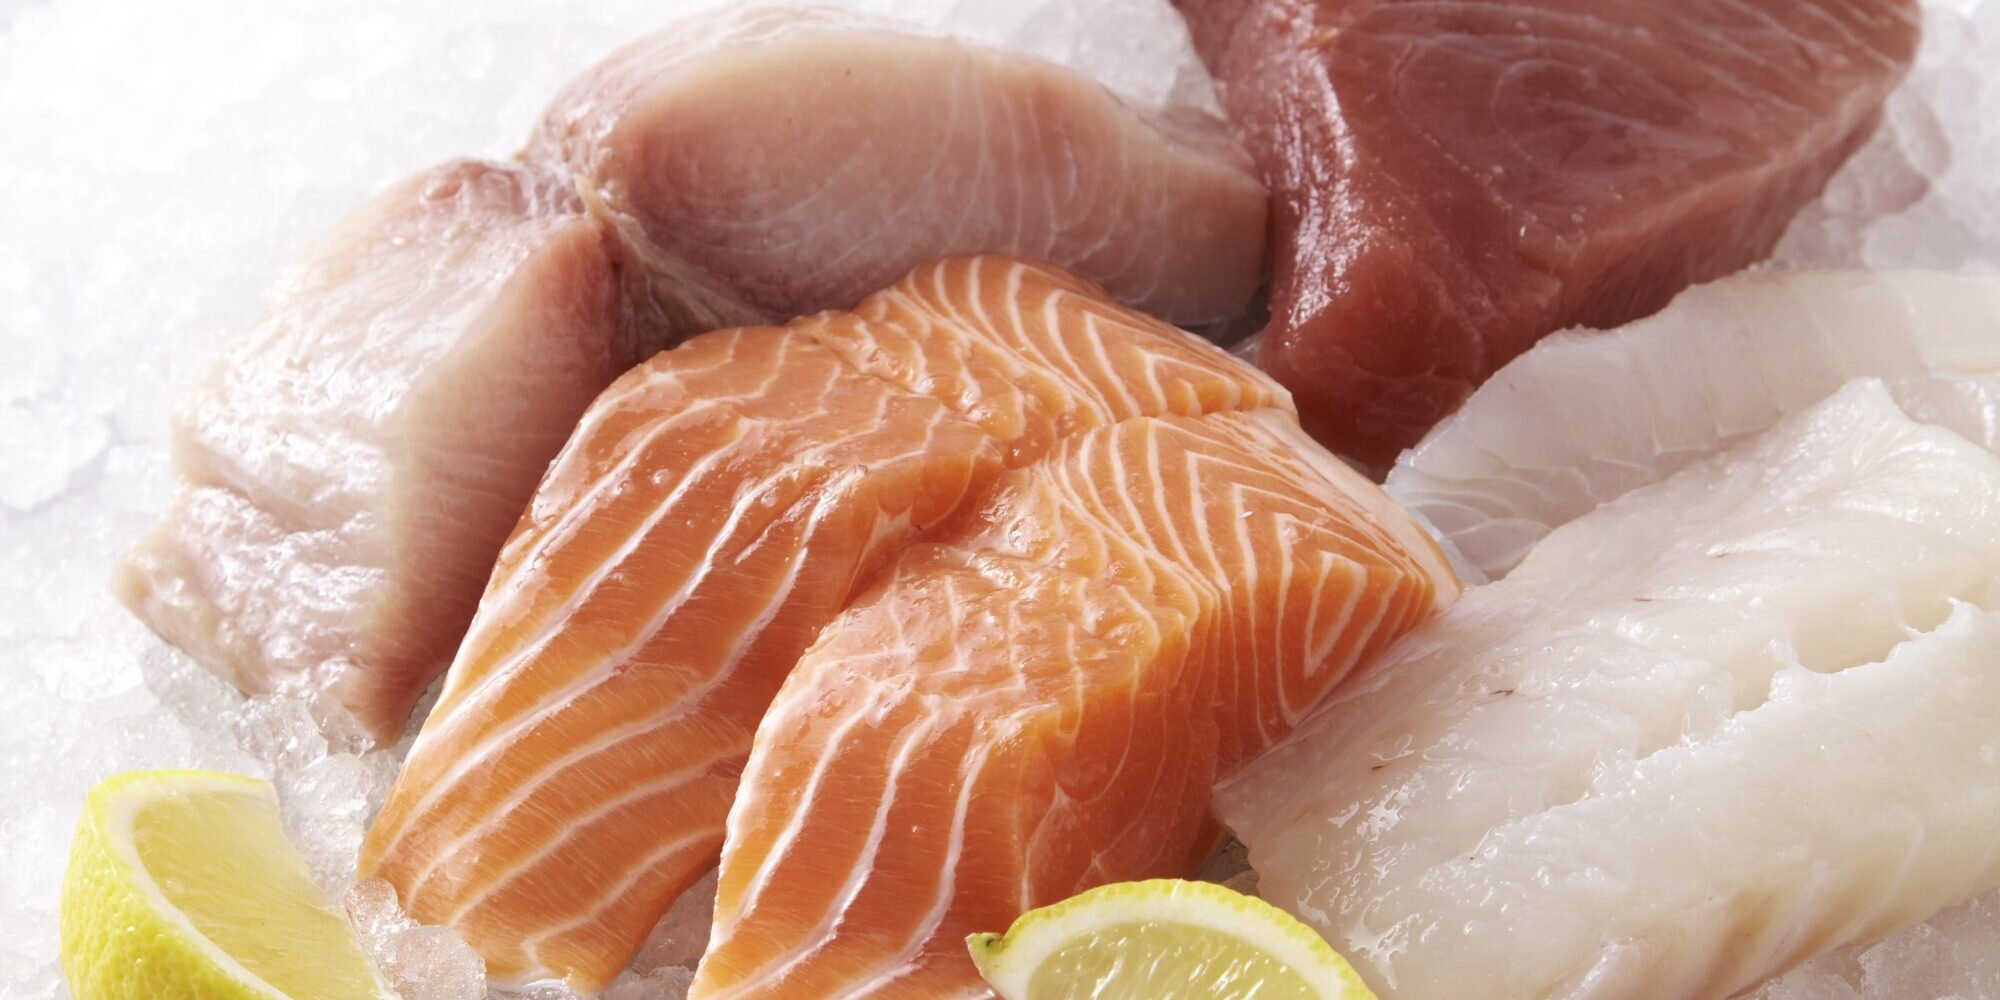 buy fresh fish online in Malaysia